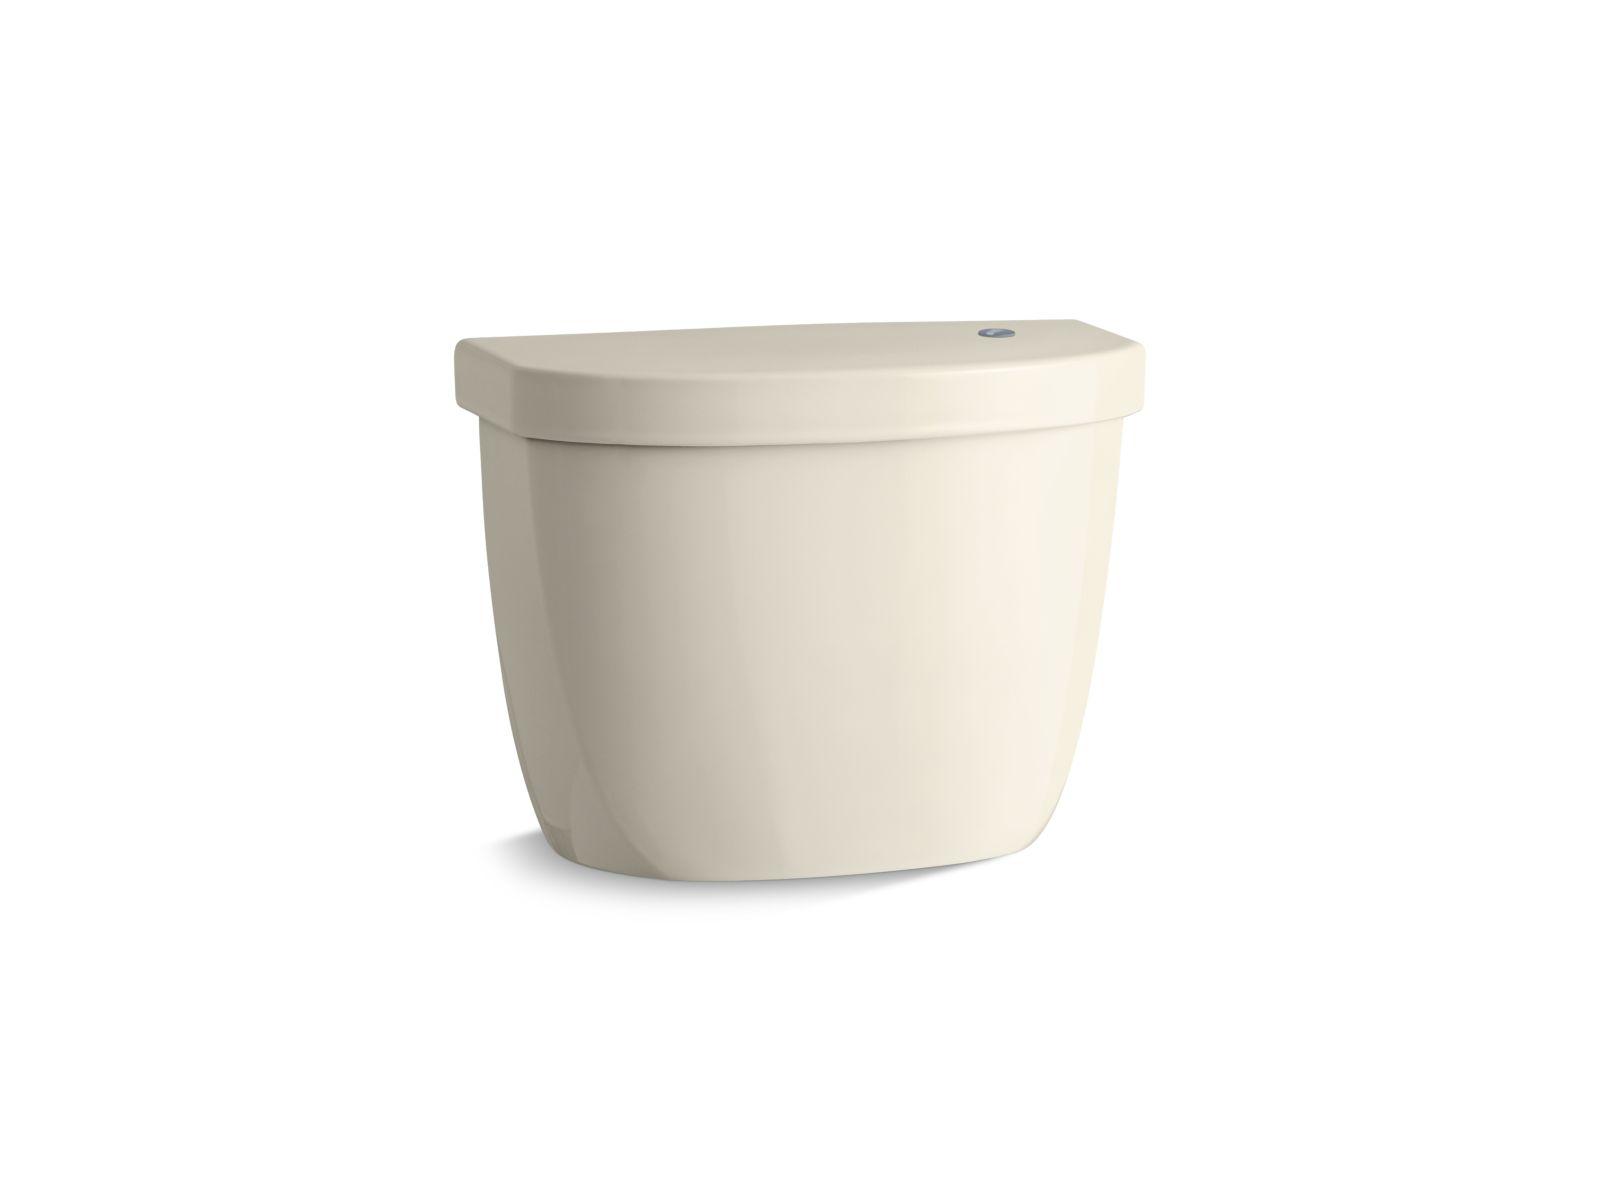 Kohler Cimarron® K-5693-47 tank for K-6419 round-front touchless toilet Almond